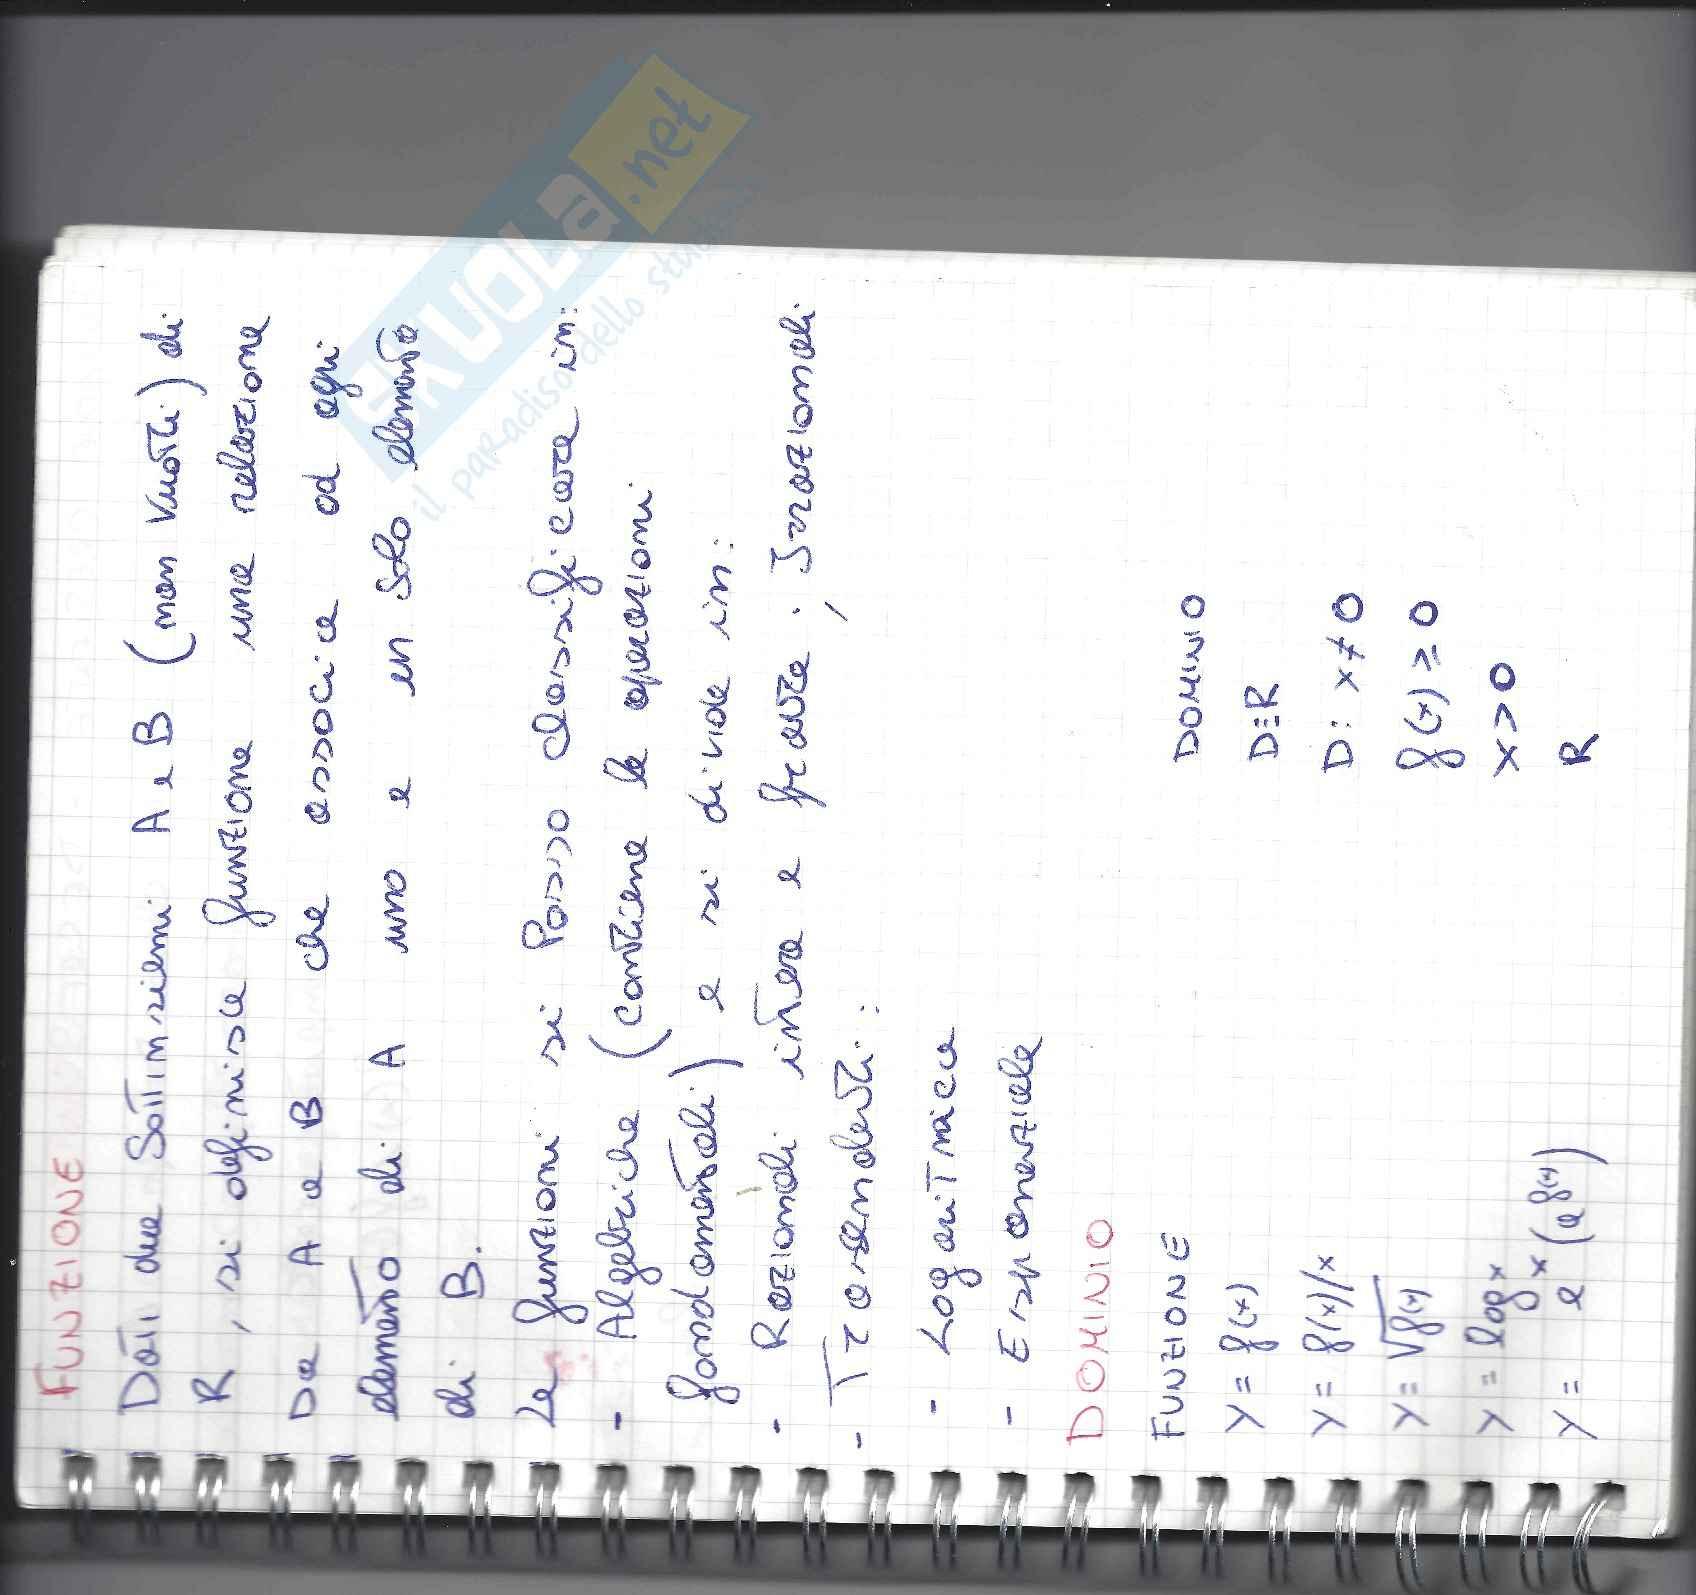 Lezioni, Analisi Matematica